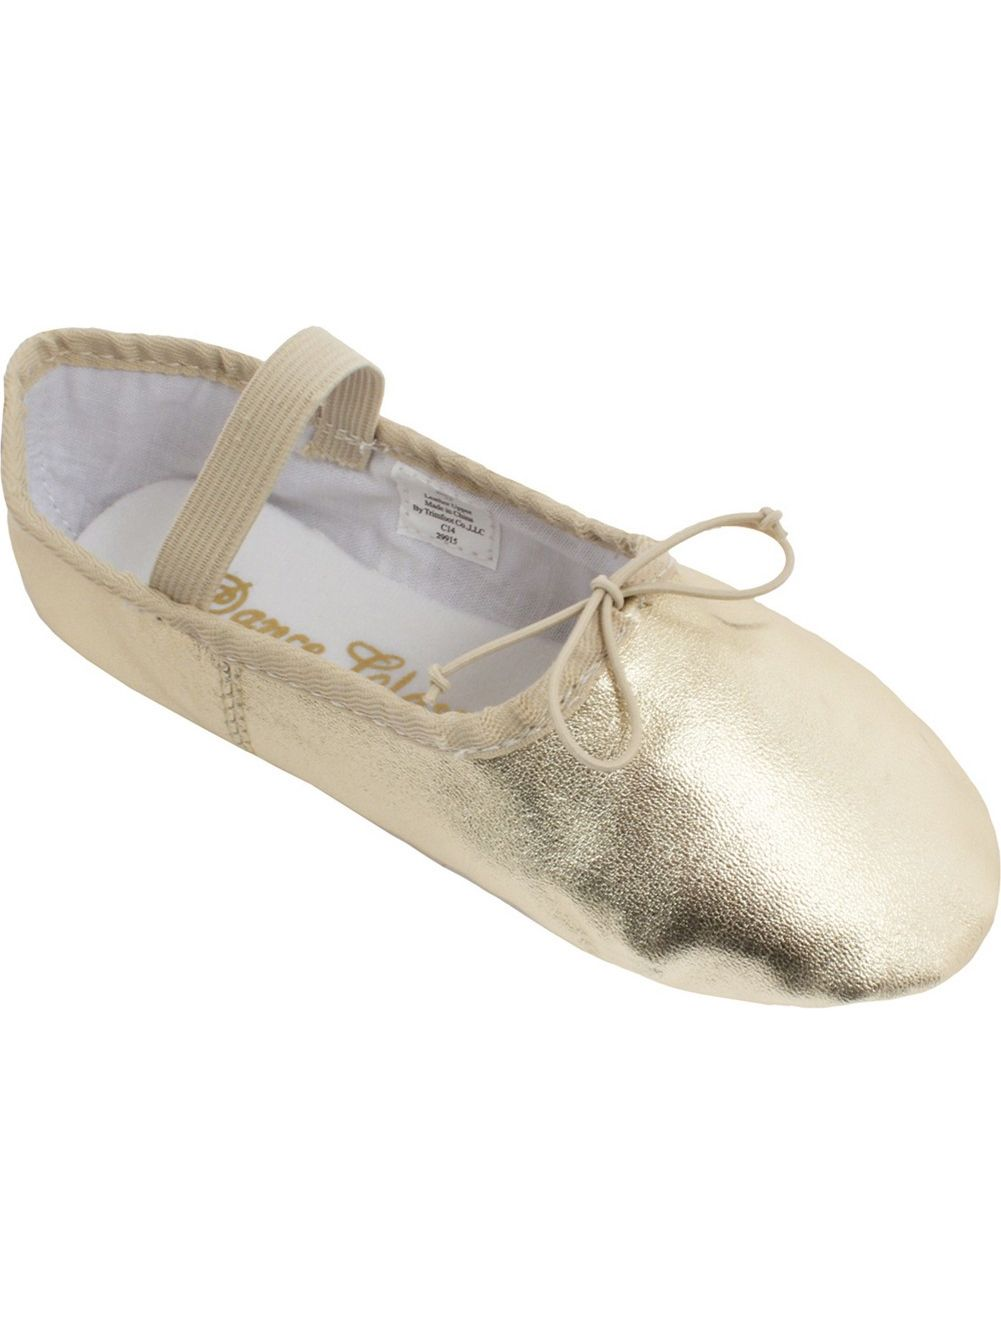 Gold Matte Metallic Shine Elastic Strap Bow Accent Ballet Shoes 5-13 Womens